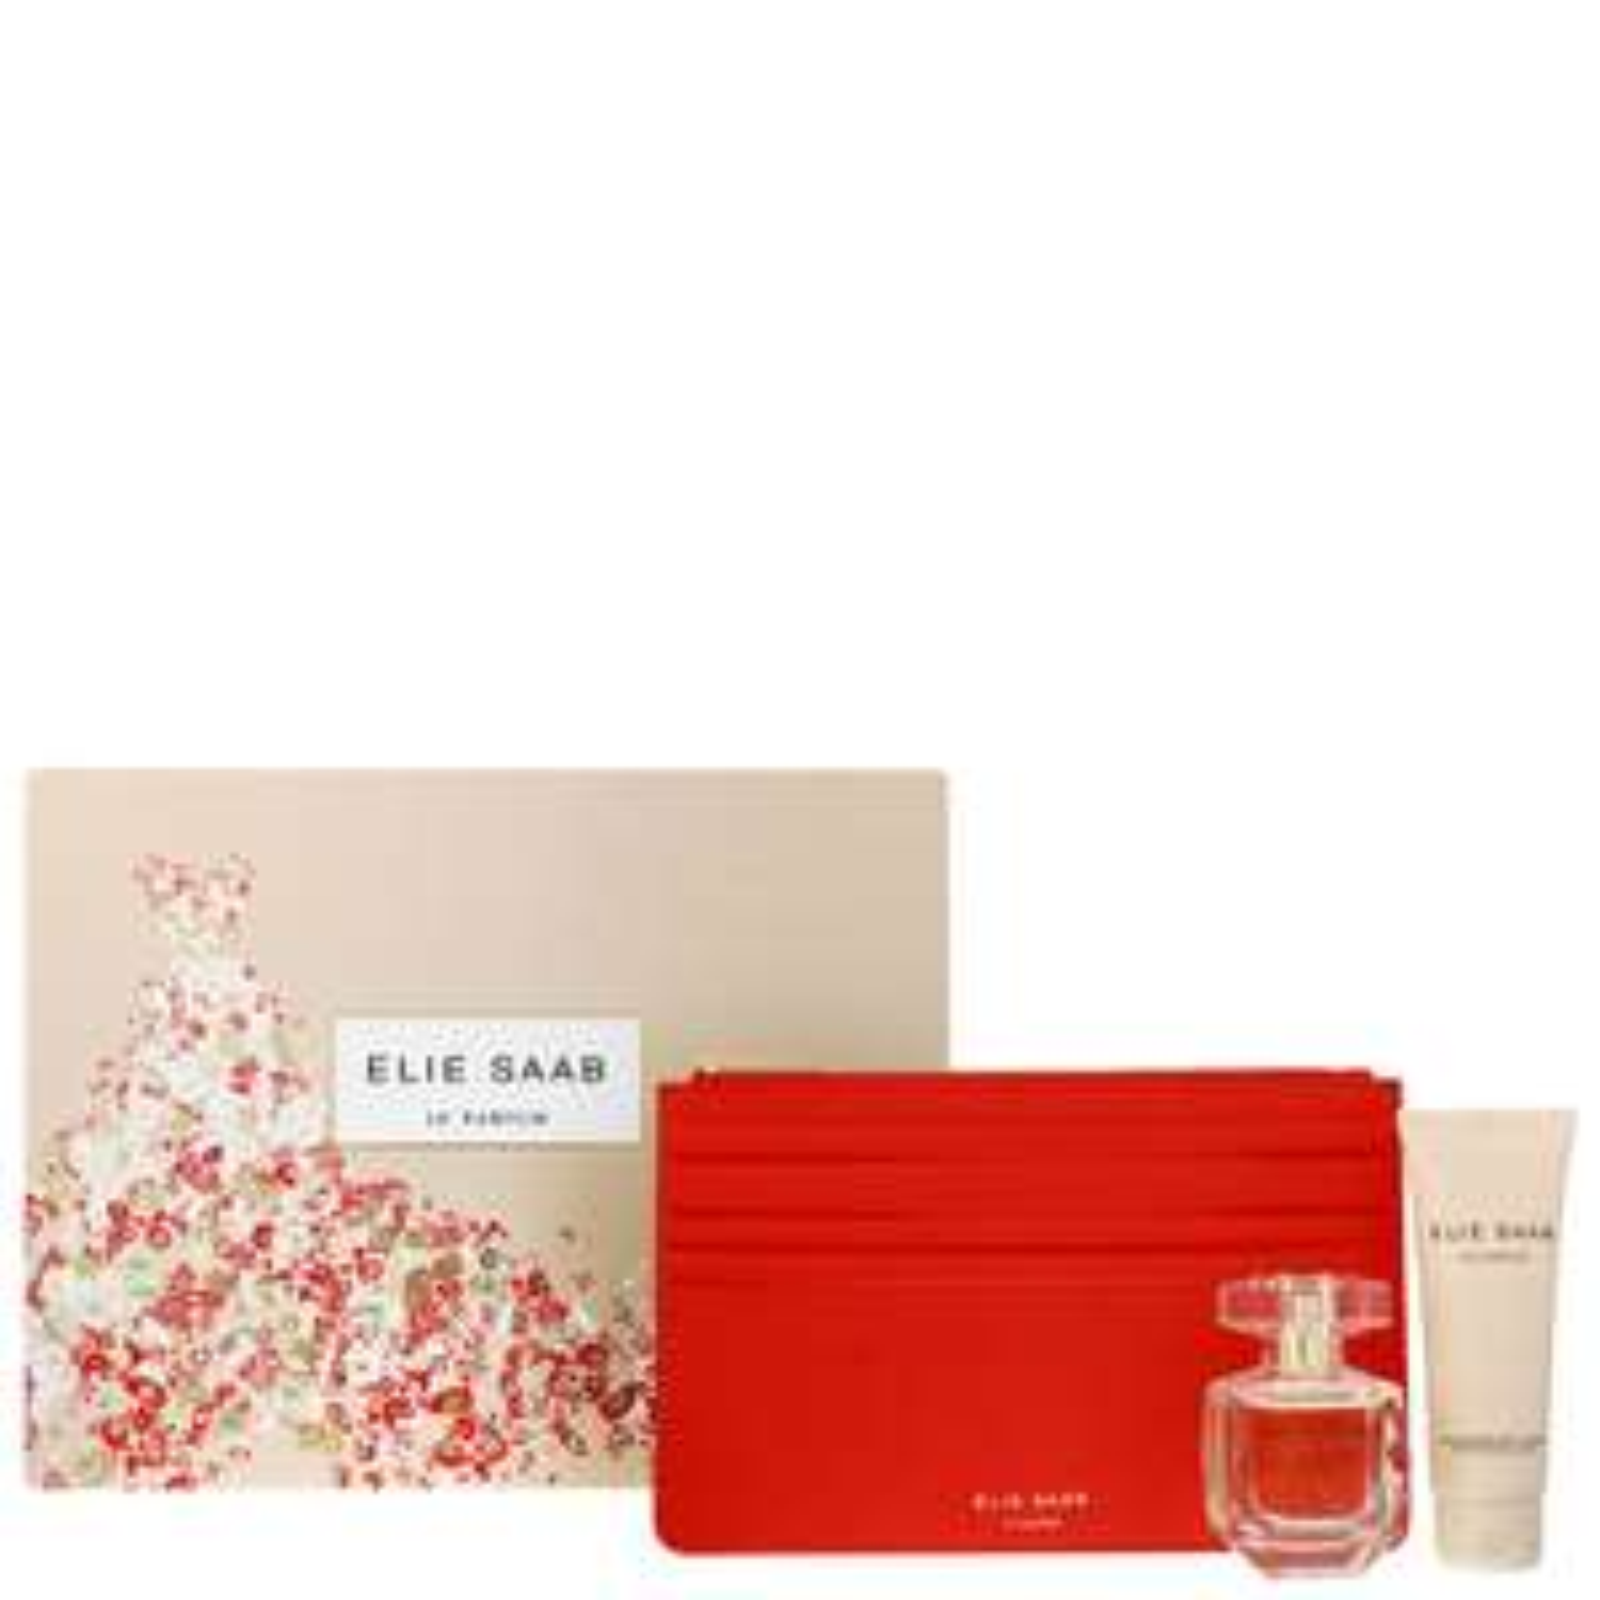 Elie Saab Le Parfum Eau de Parfum Spray 50ml Gift Set £34.80 at All Beauty